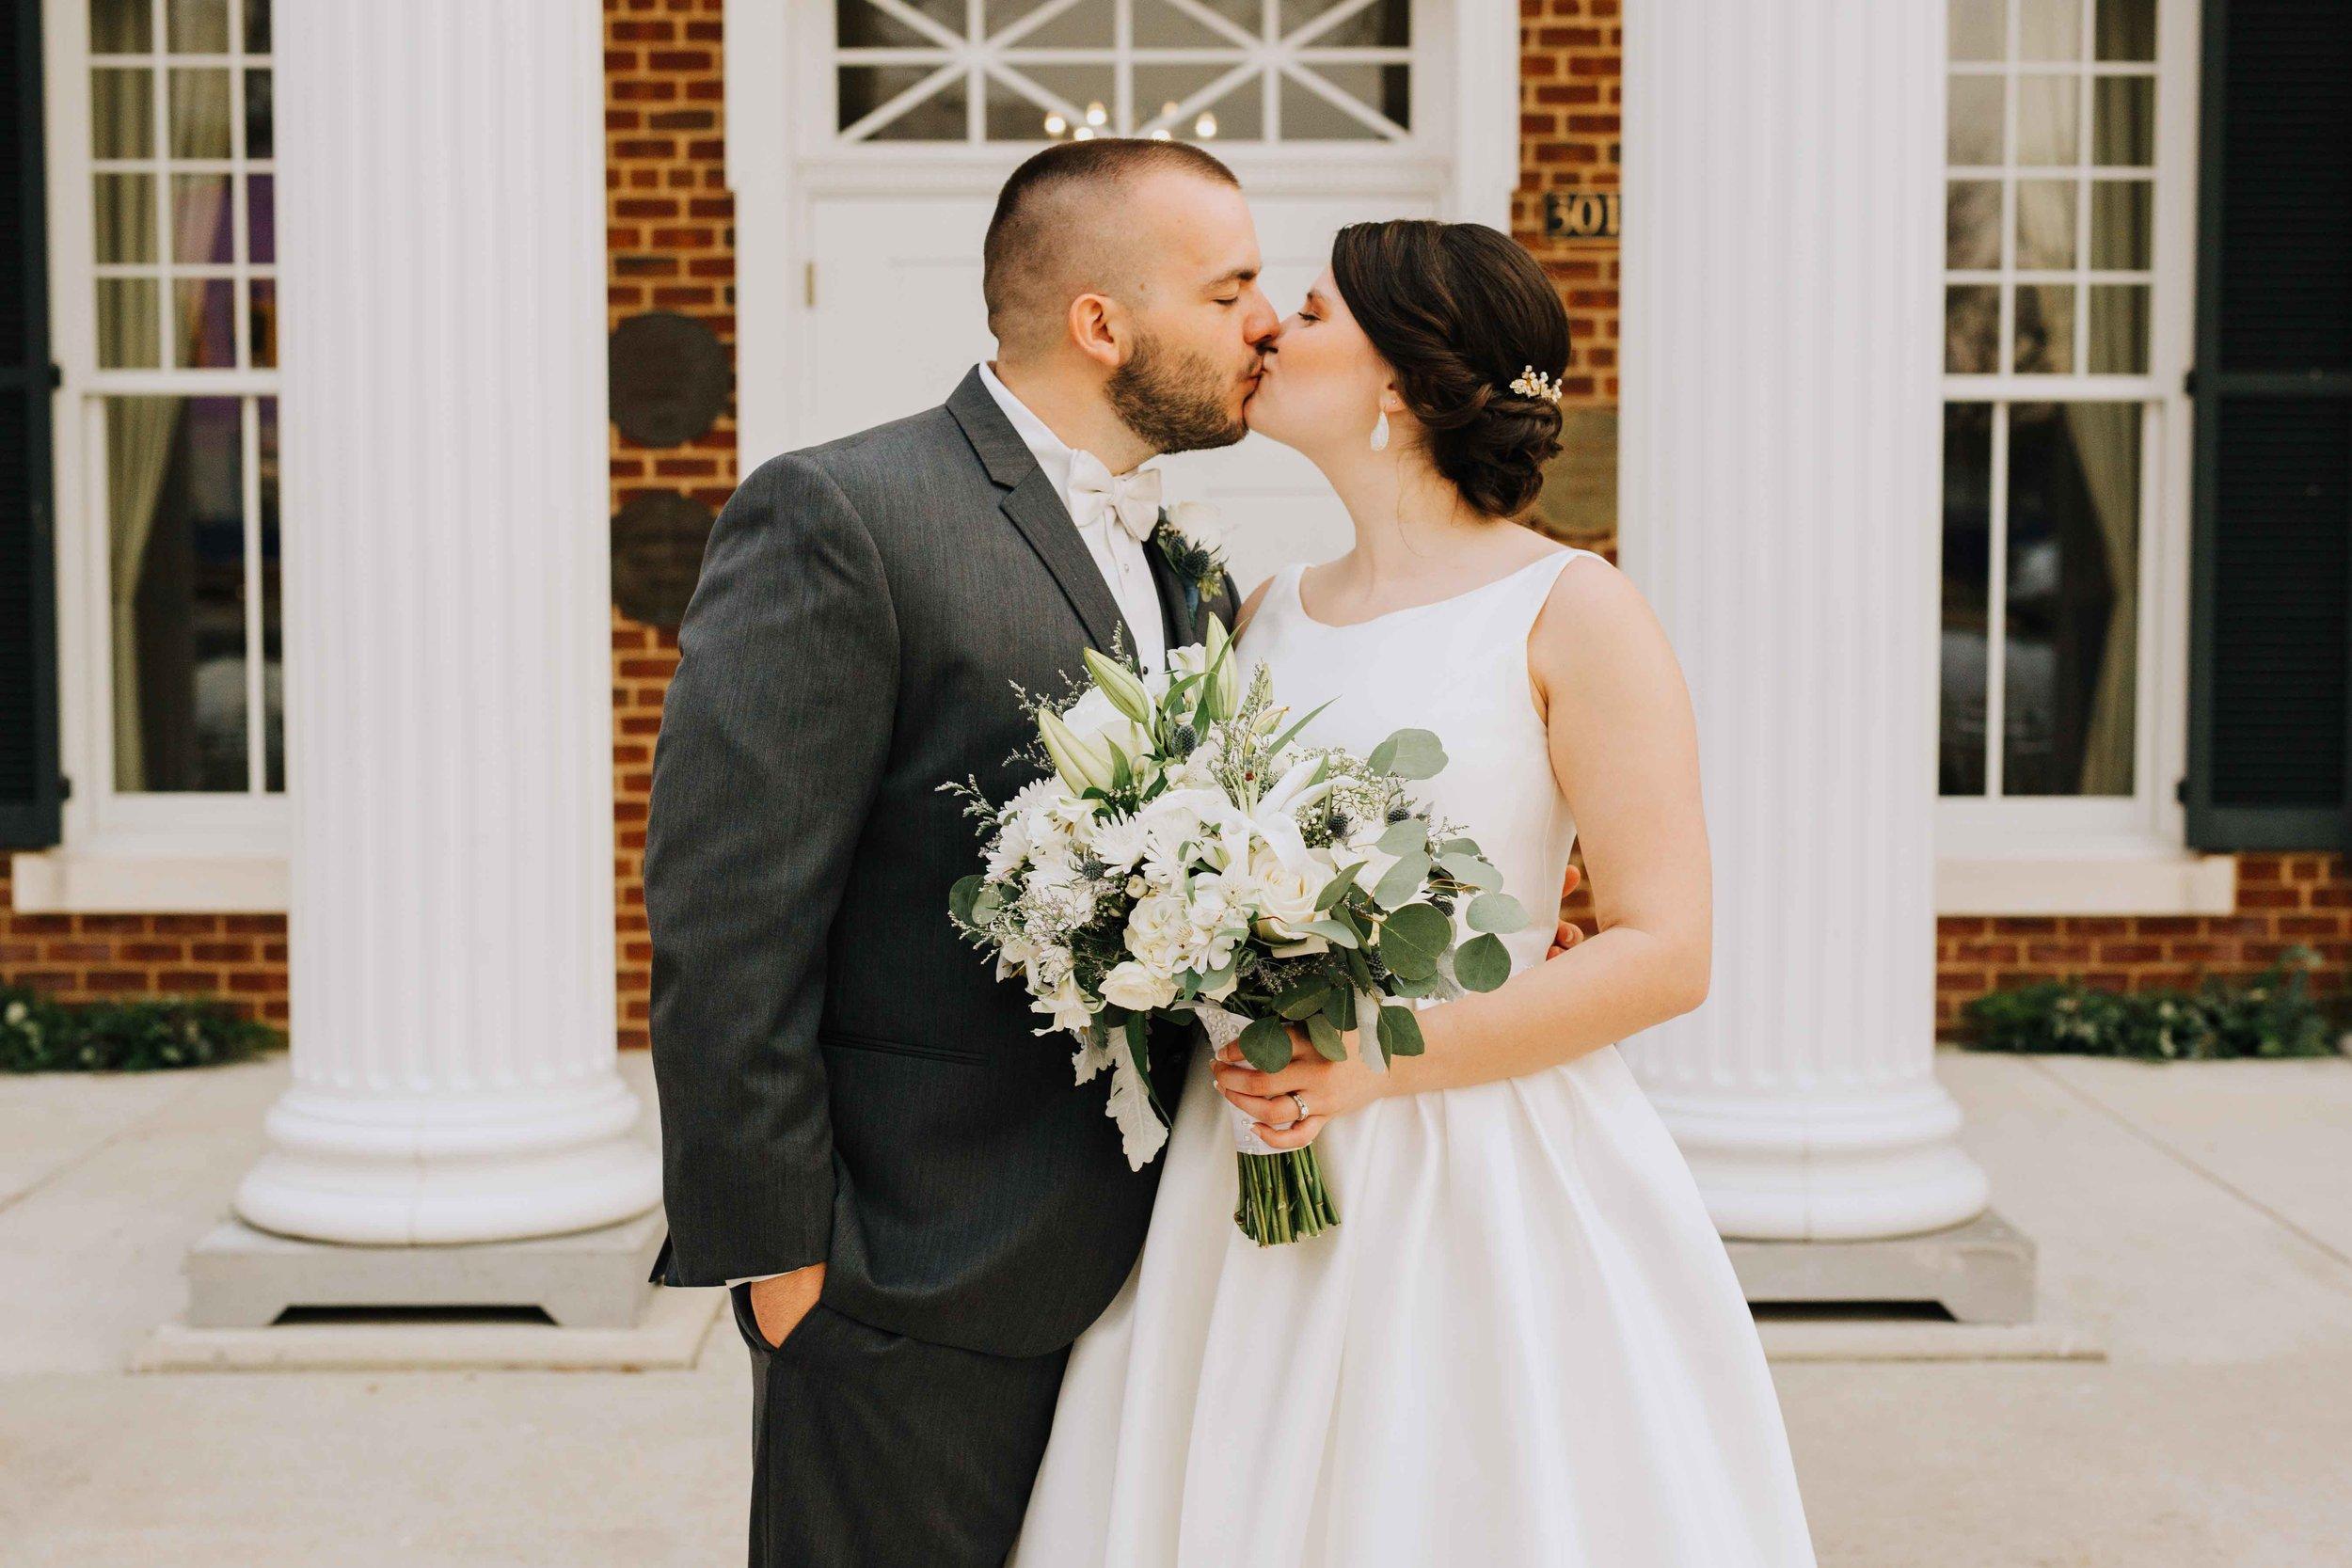 Farmville-Virginia-Wedding-Hotel-Weynoke-Downtown-Jacqueline-Waters-Photography-Detailed- (1300).jpg